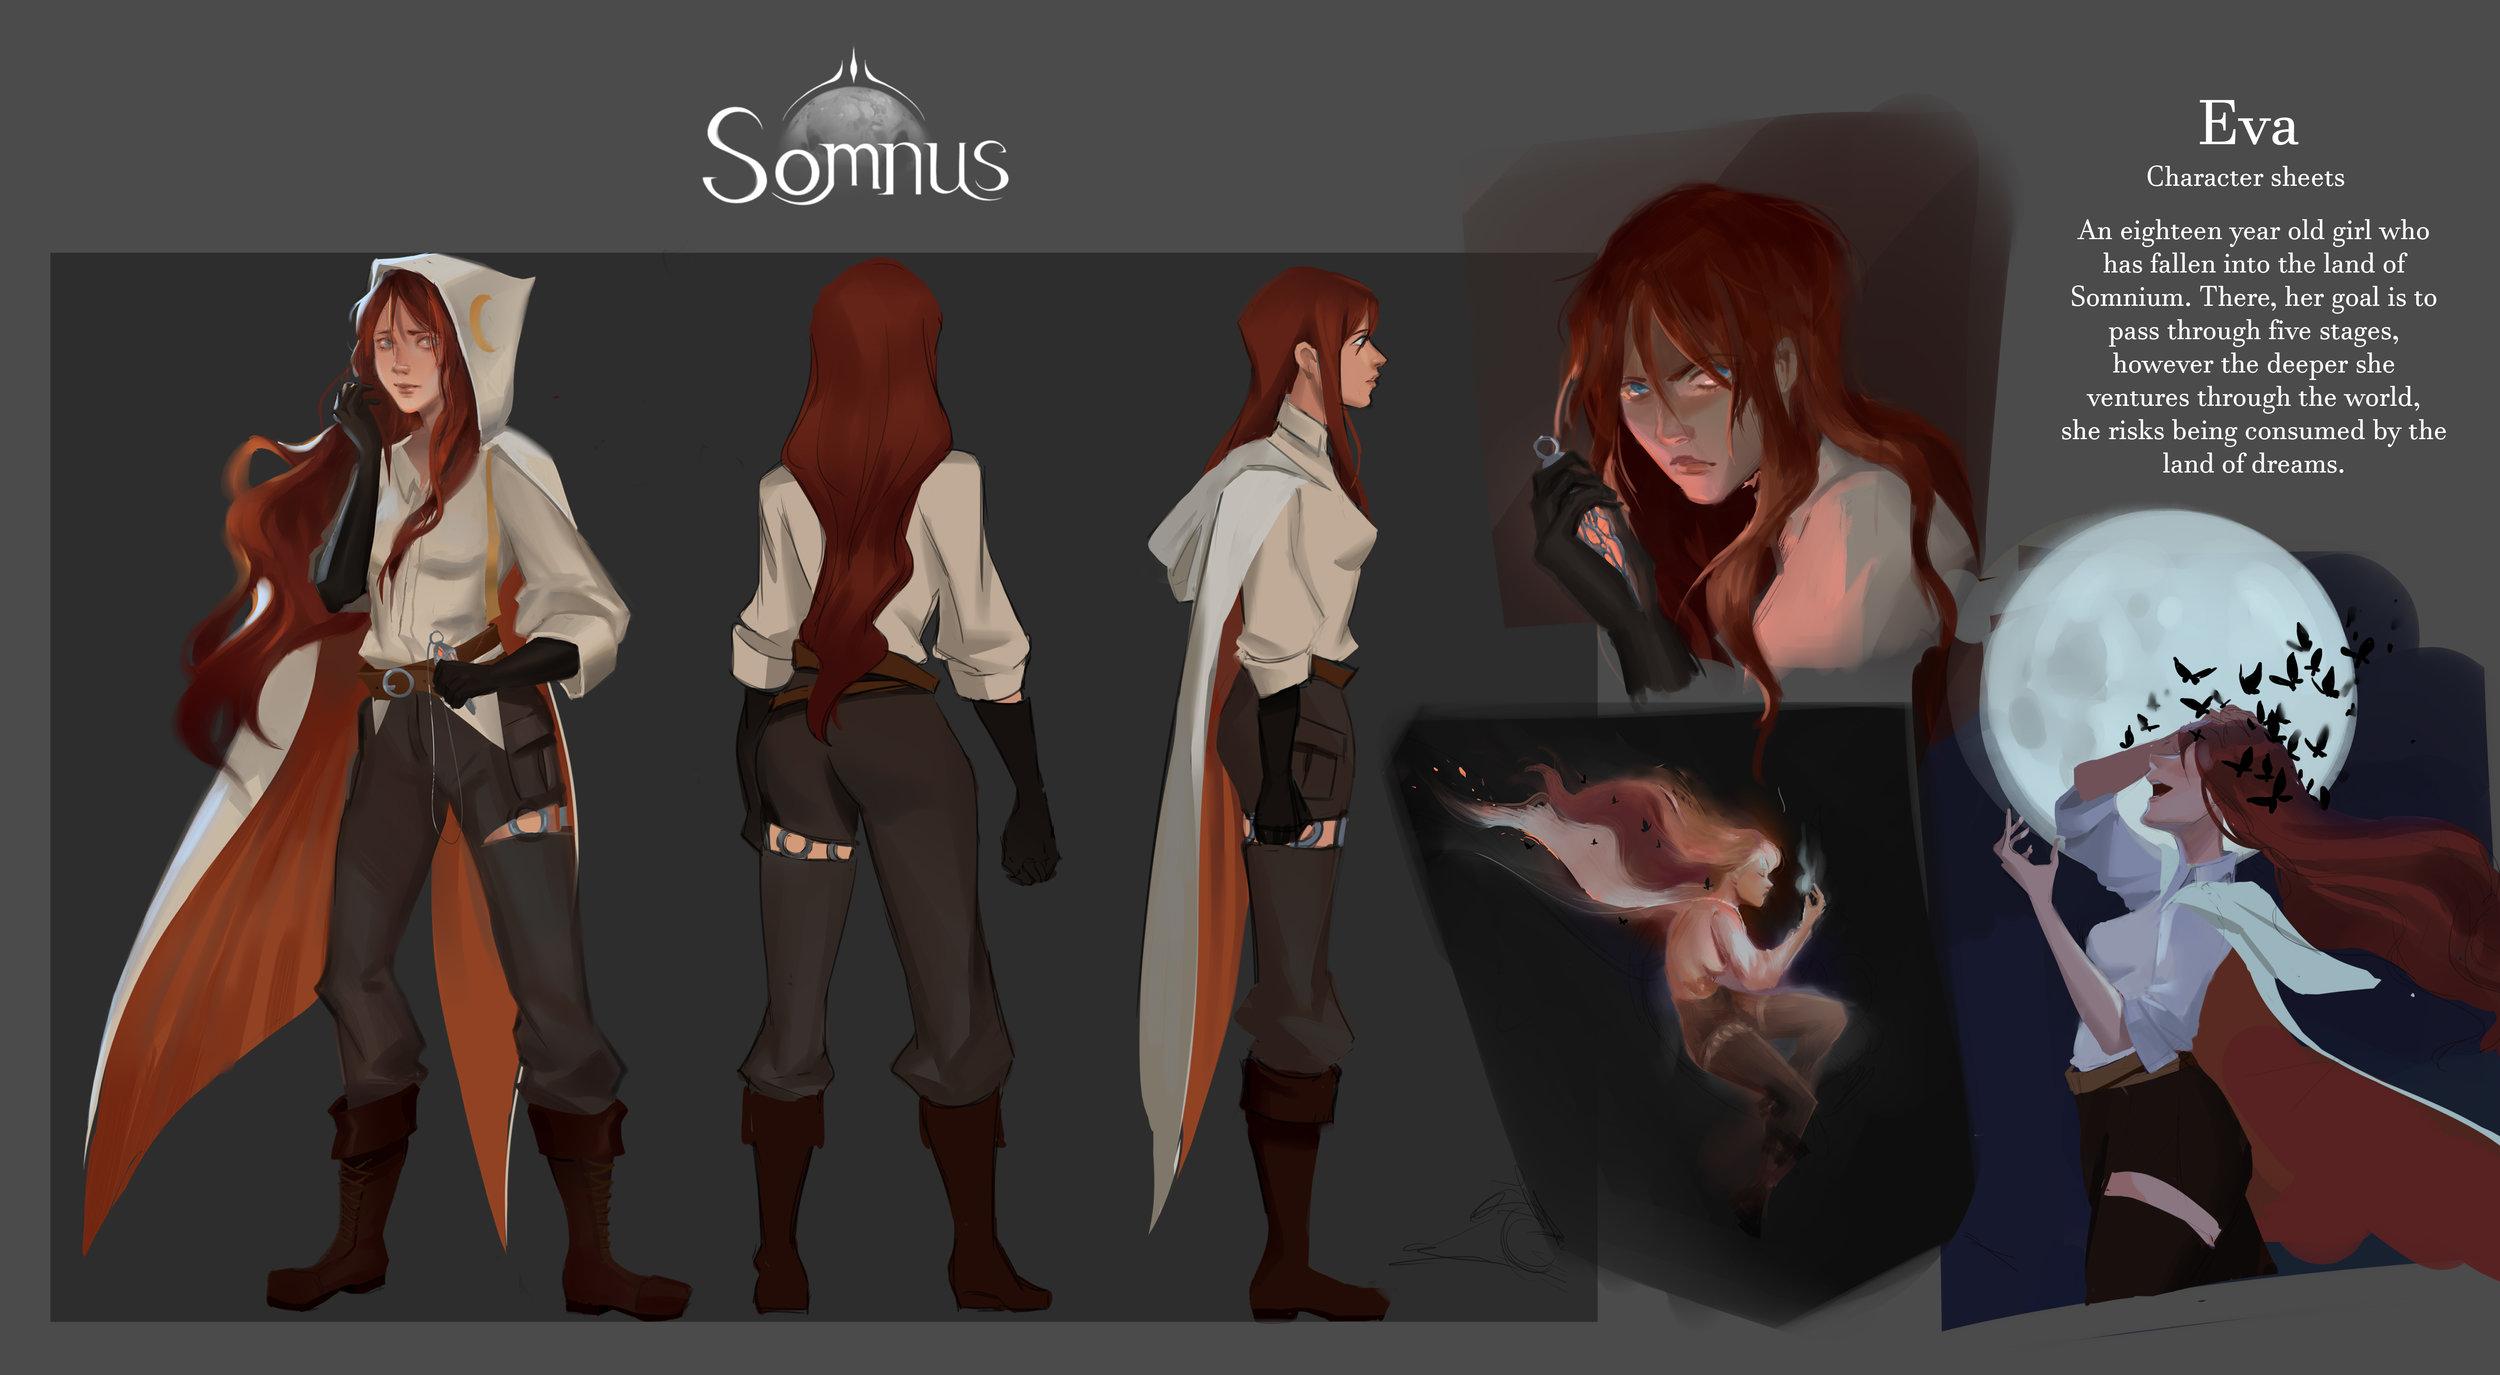 Somnus_Eva_Charactersheetwip.jpg